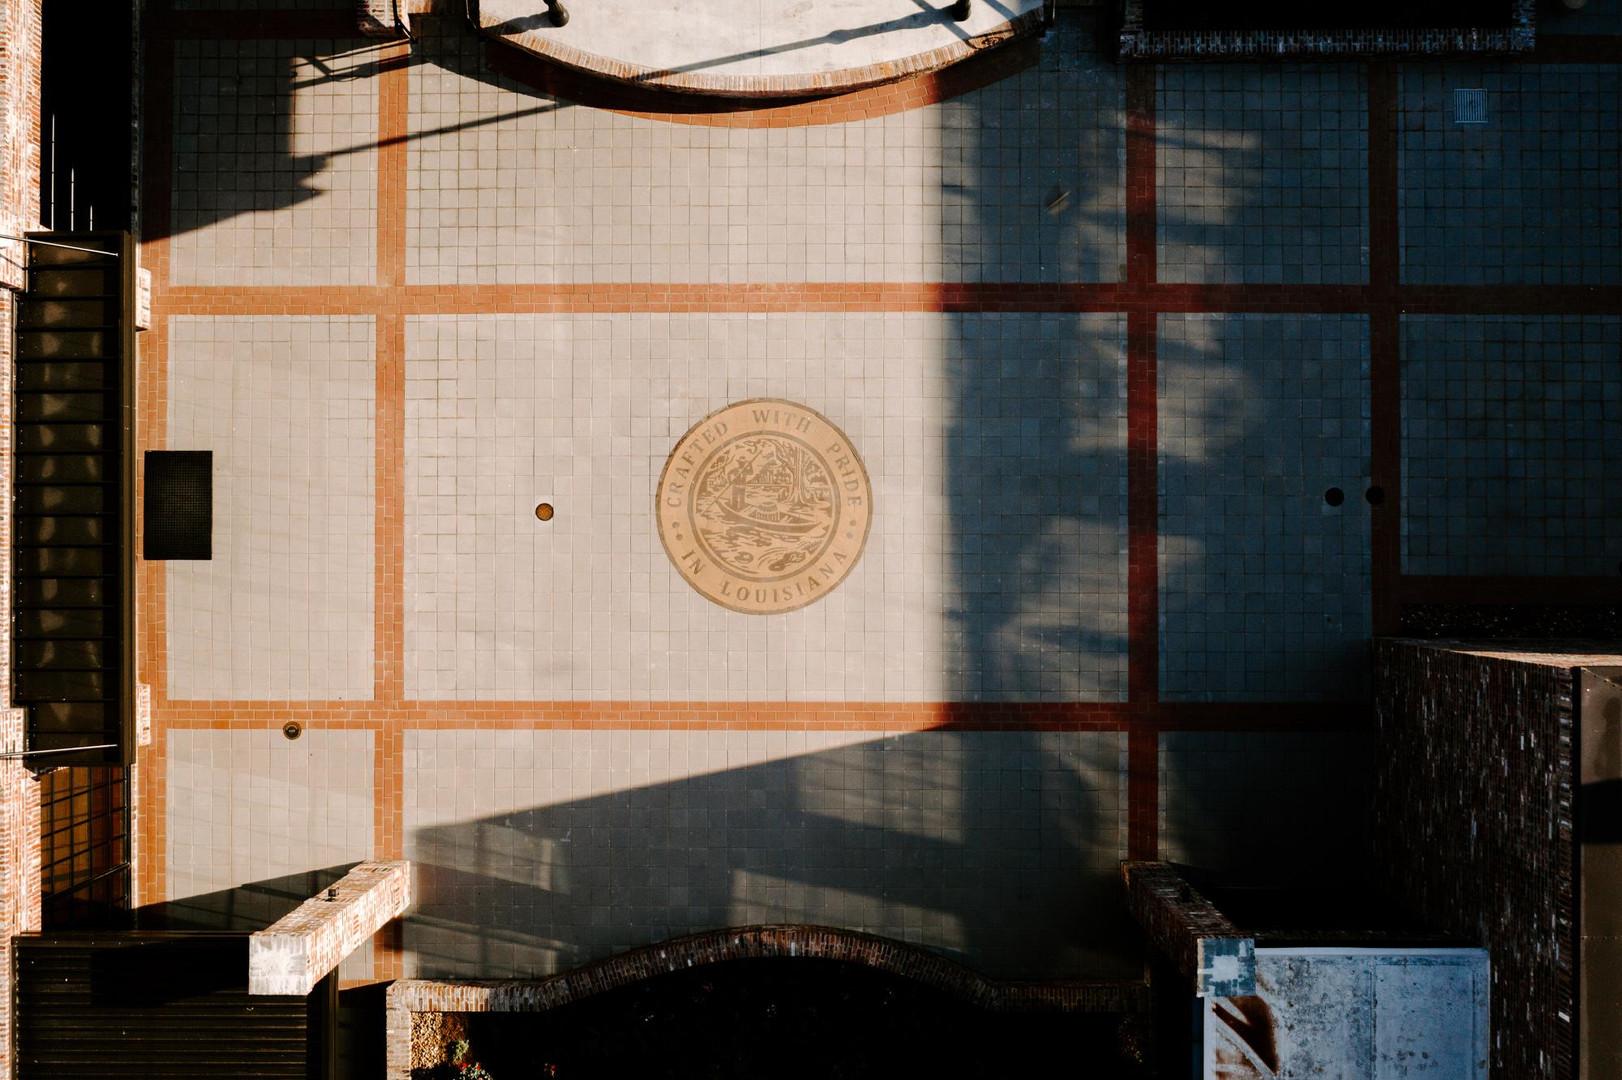 Bayou Rum Photo by ZakkShane - Baton Rouge & Lake Charles Photography + Videography.